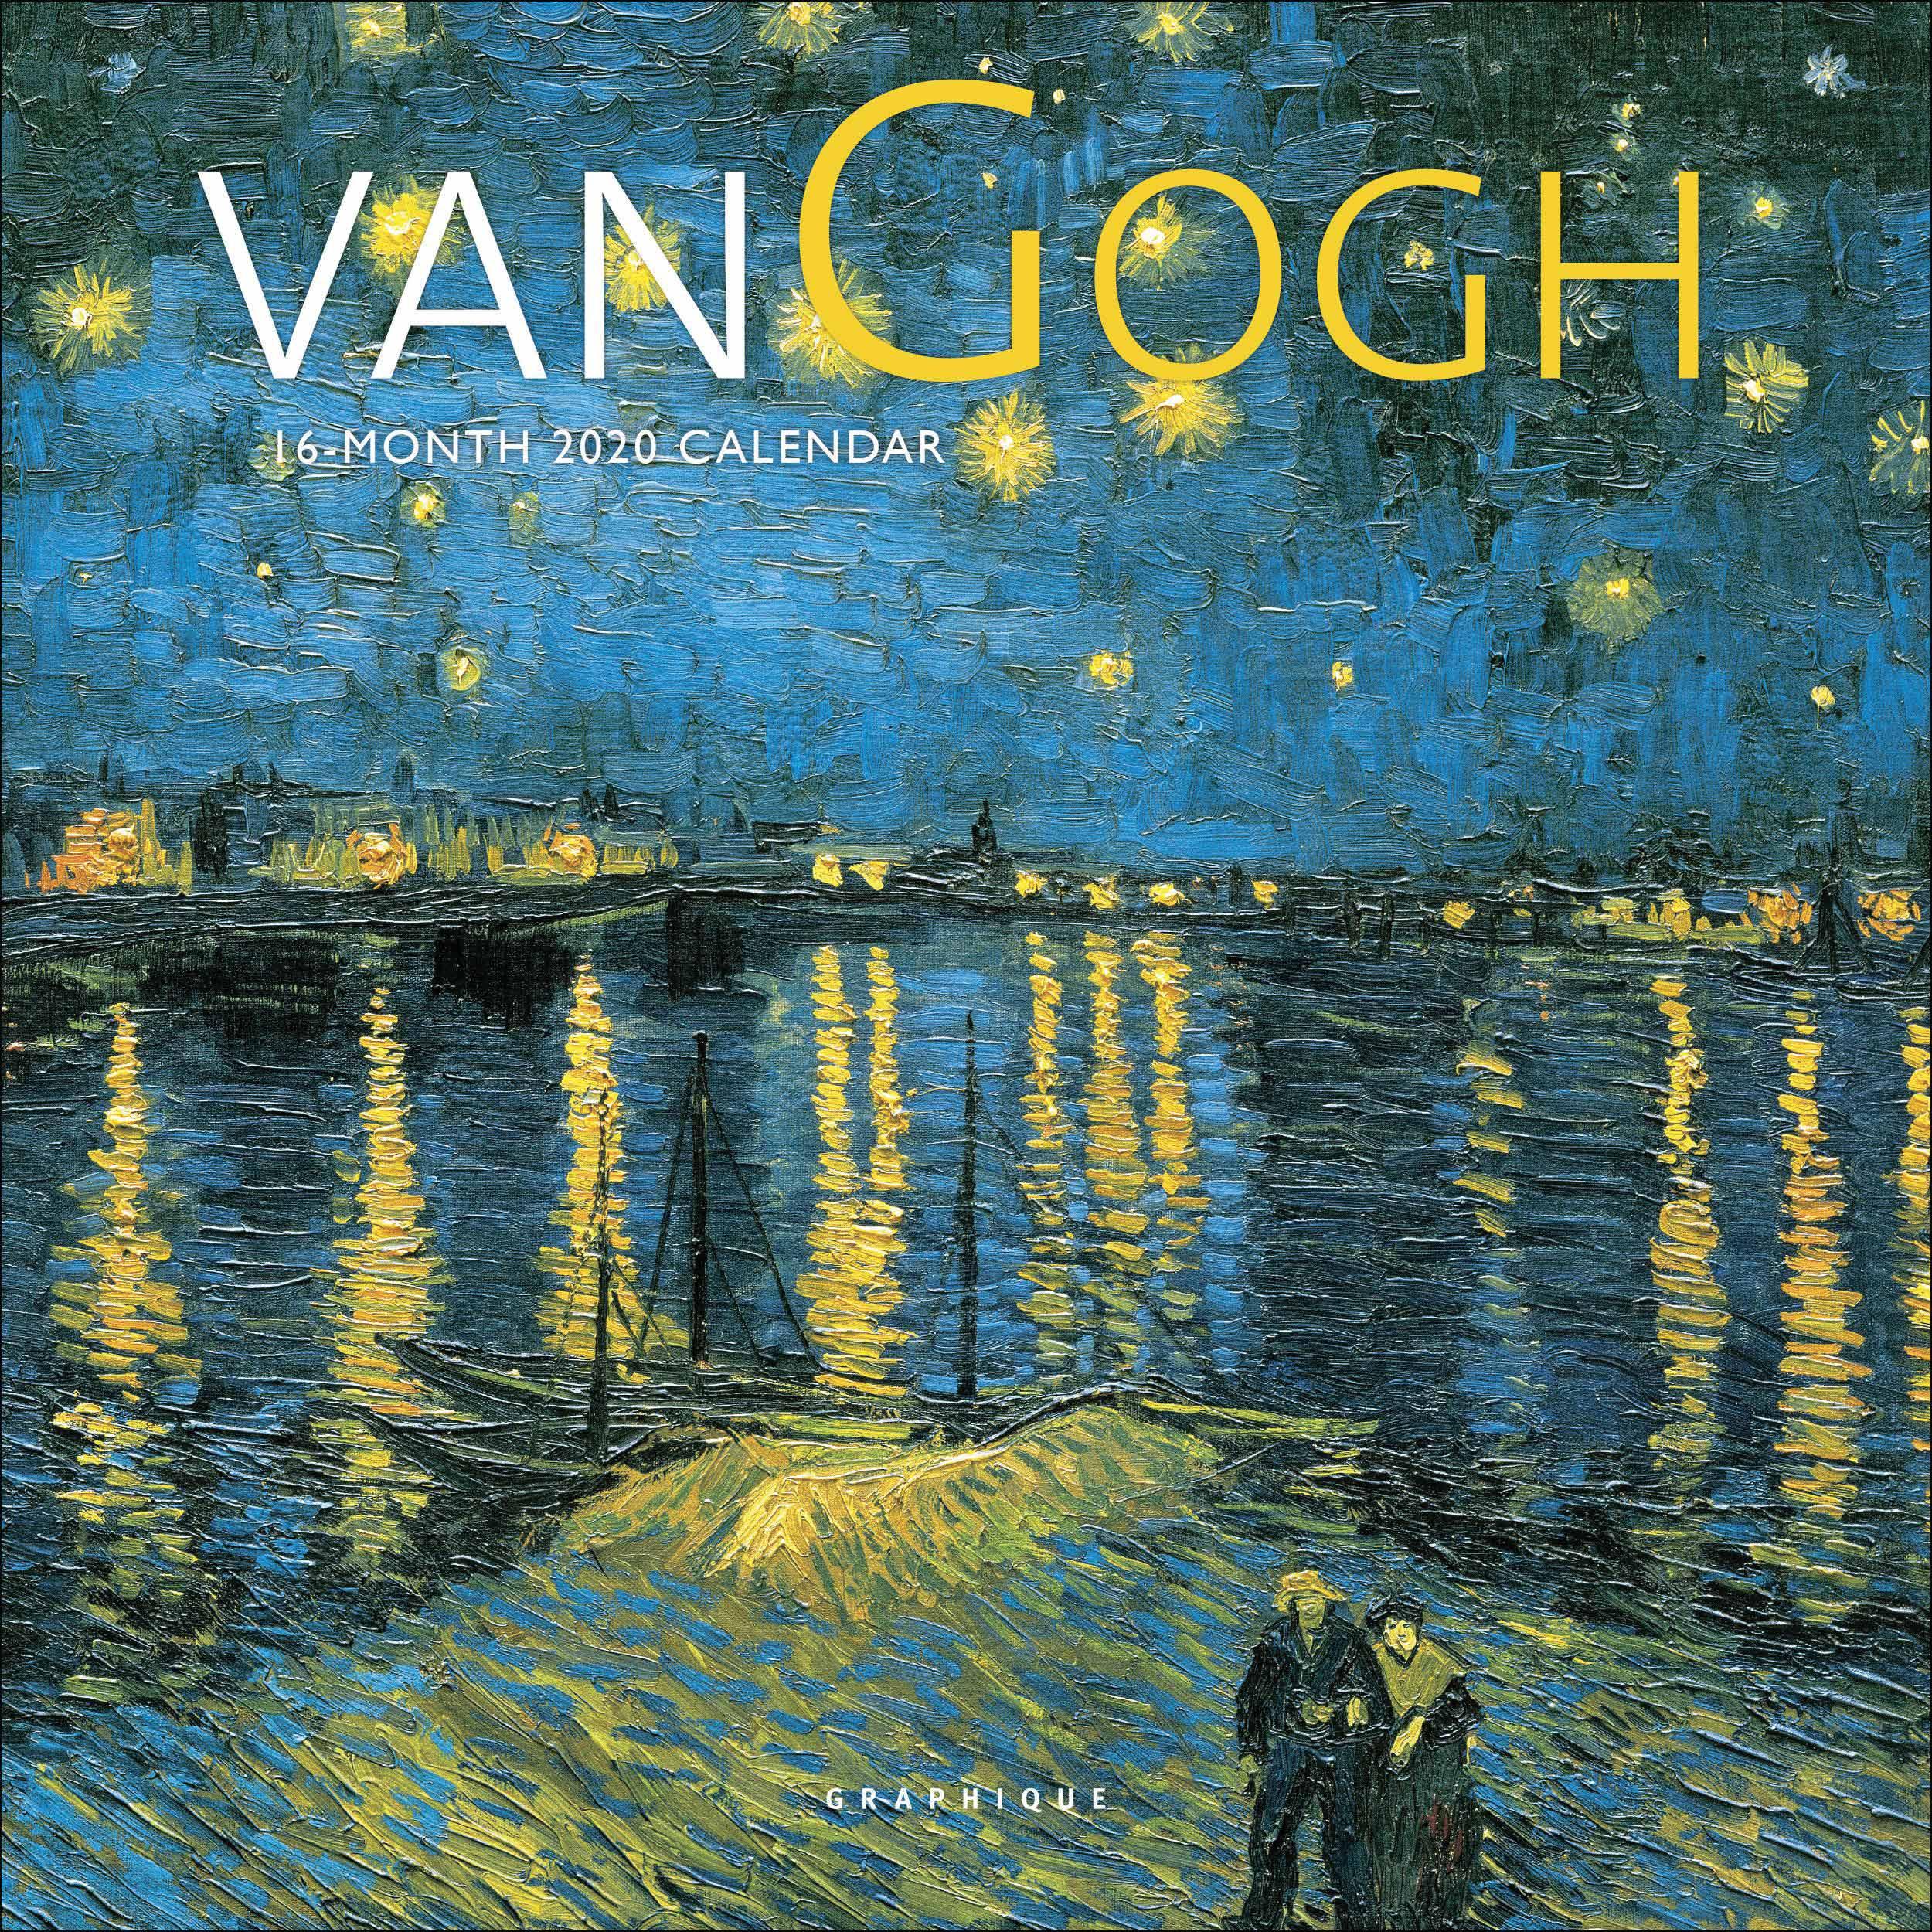 Van Gogh Mini Calendar 2020